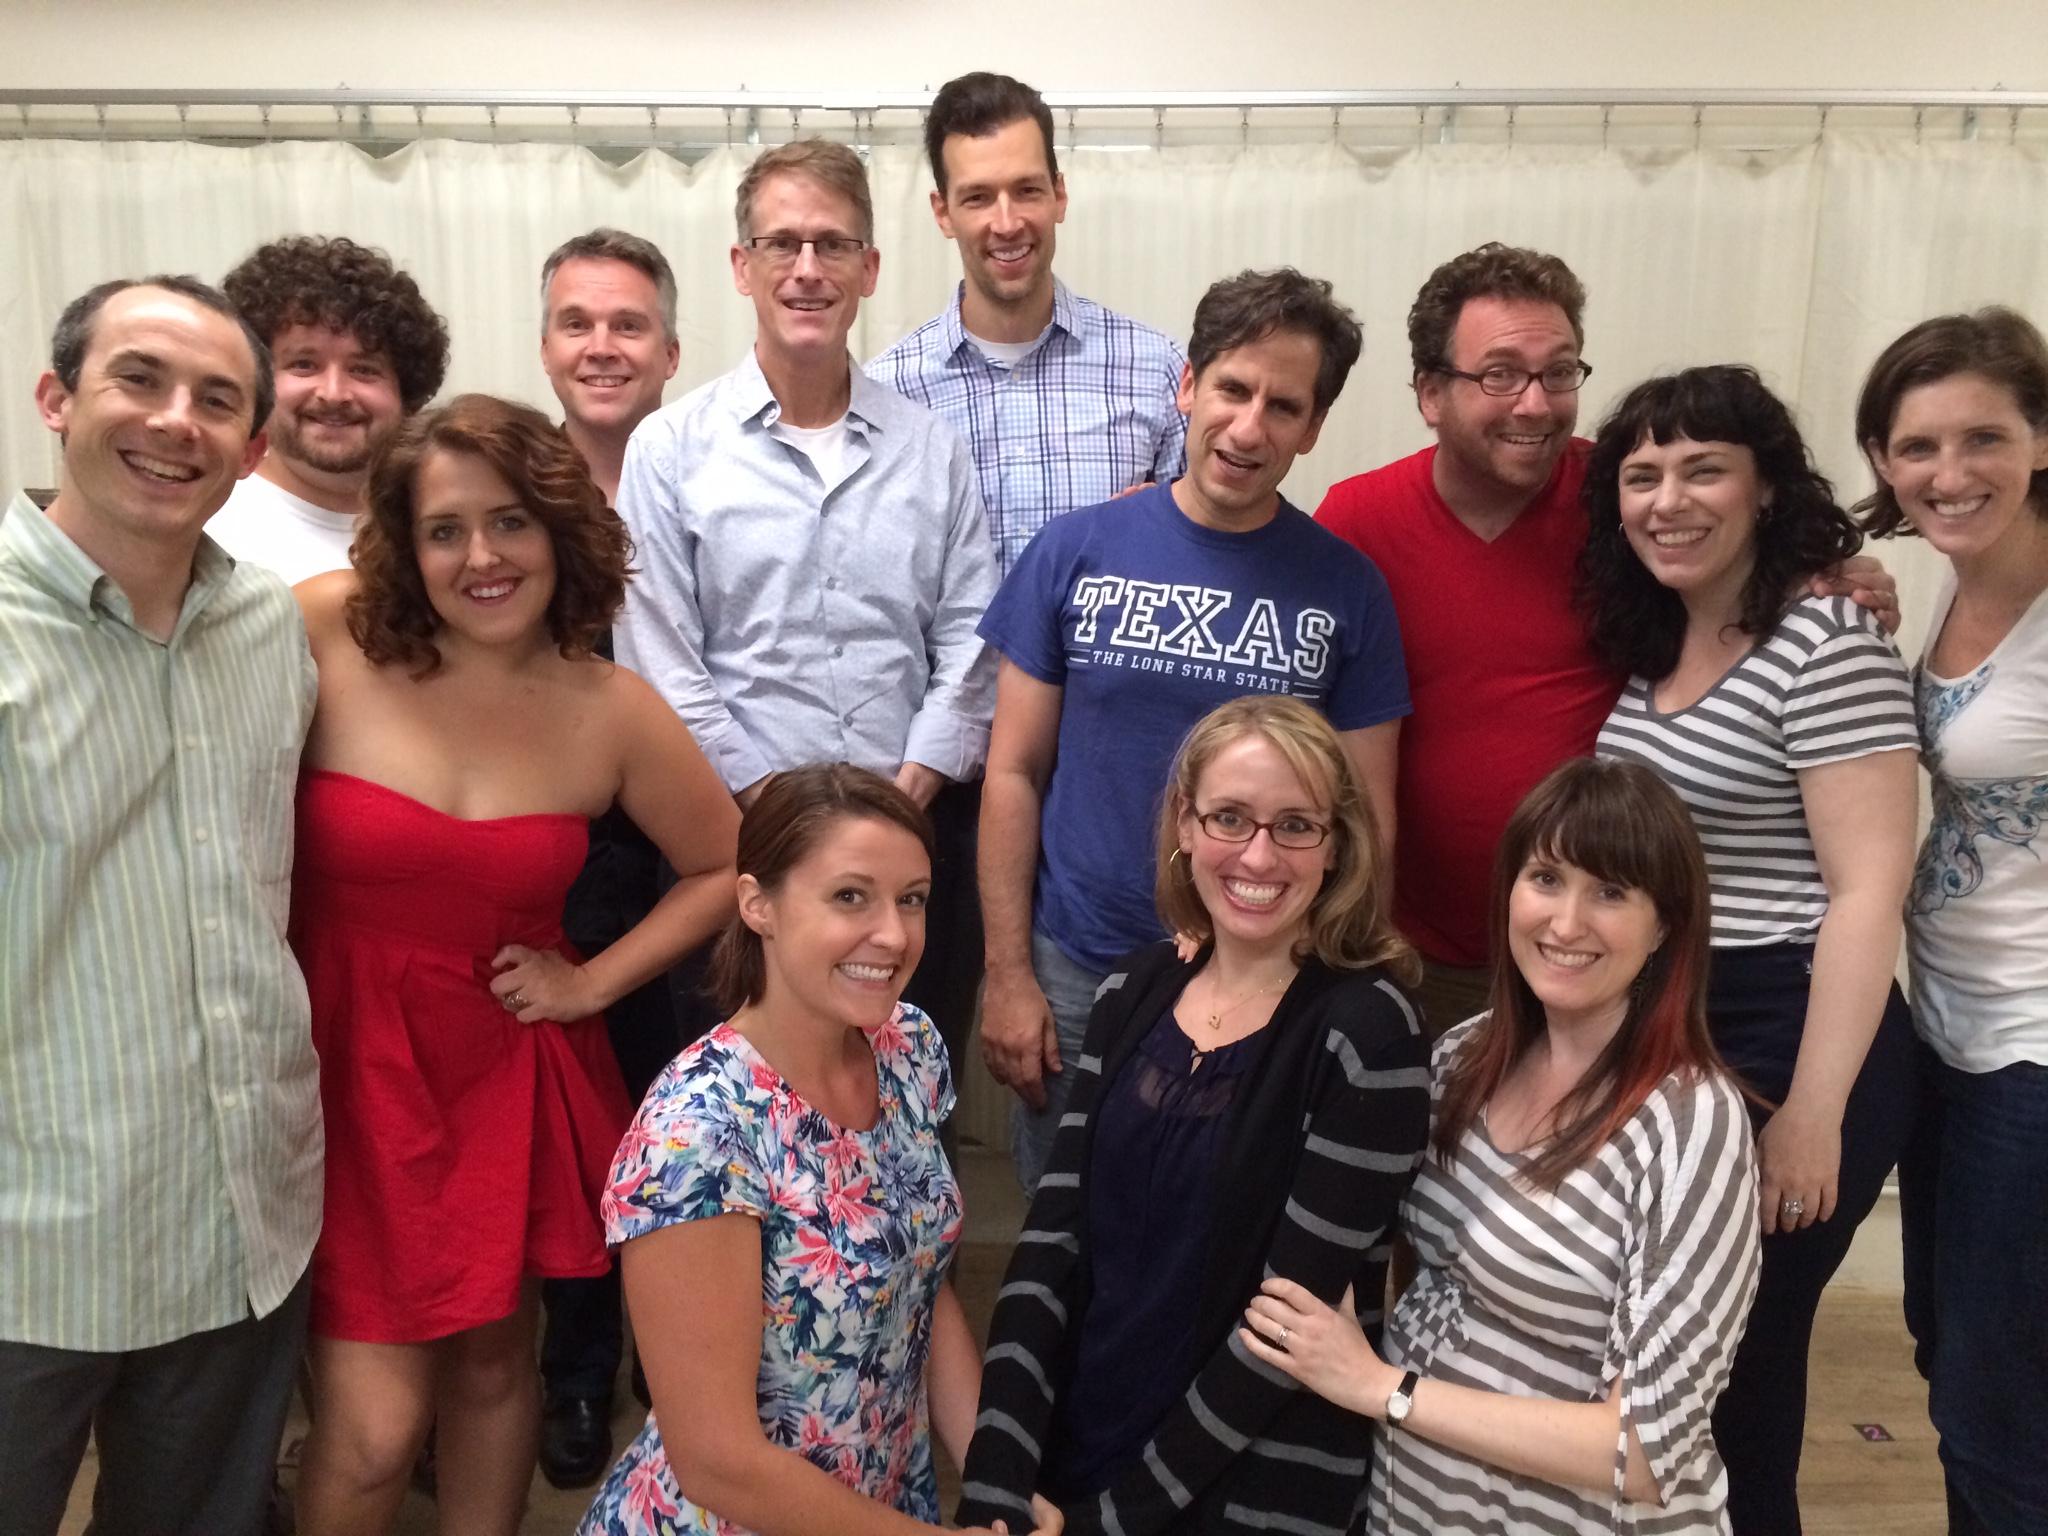 The company with Seth Rudetsky and Tony nominee Dick Scanlan.